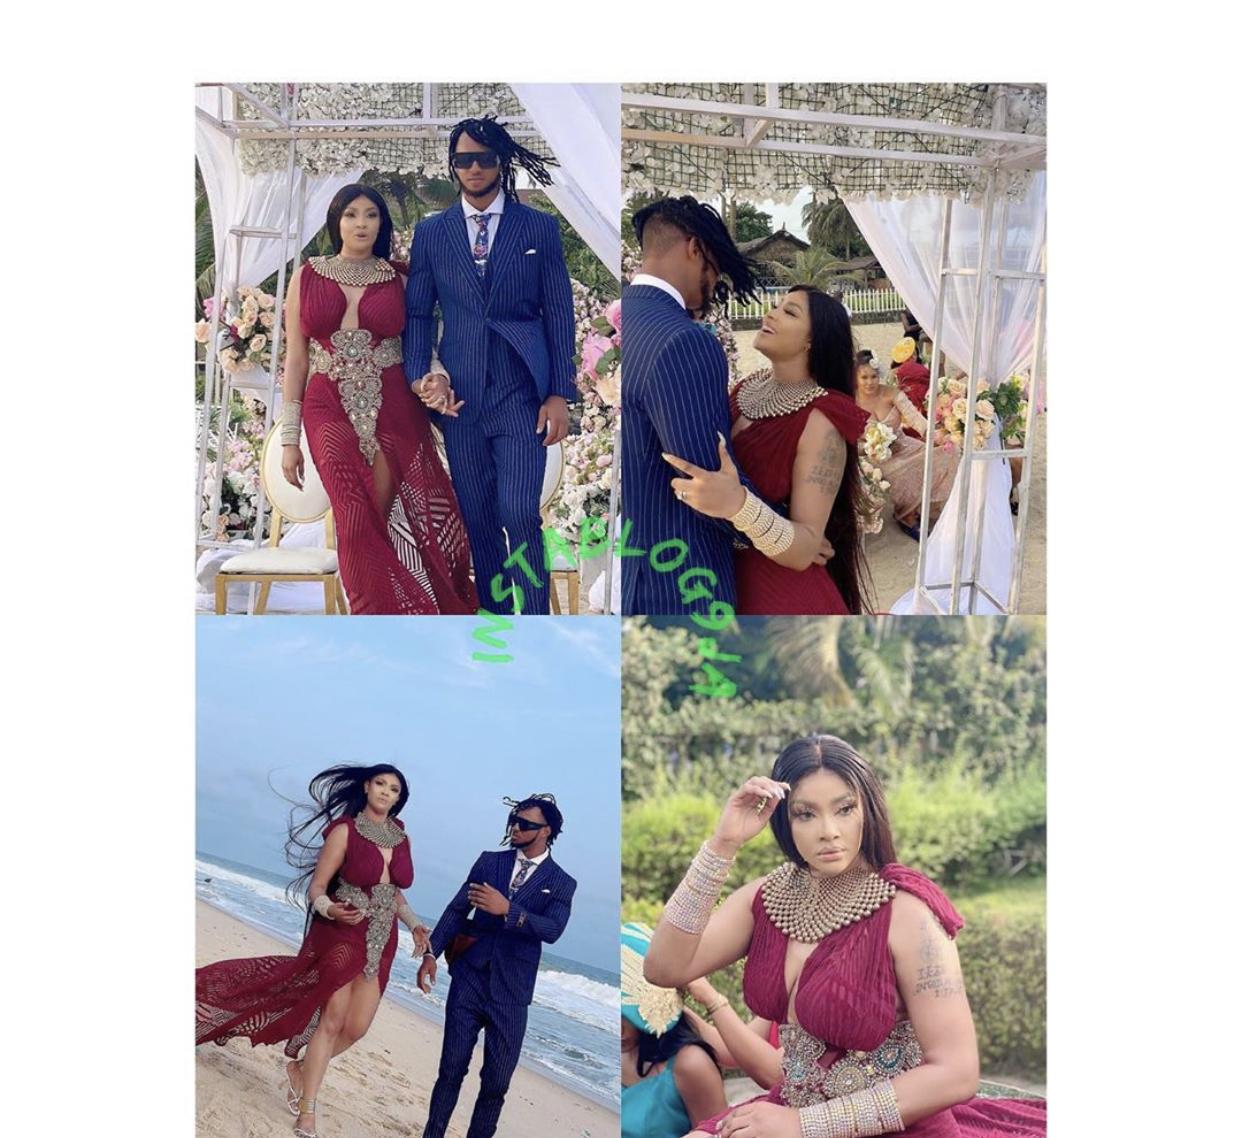 Photos of the couple